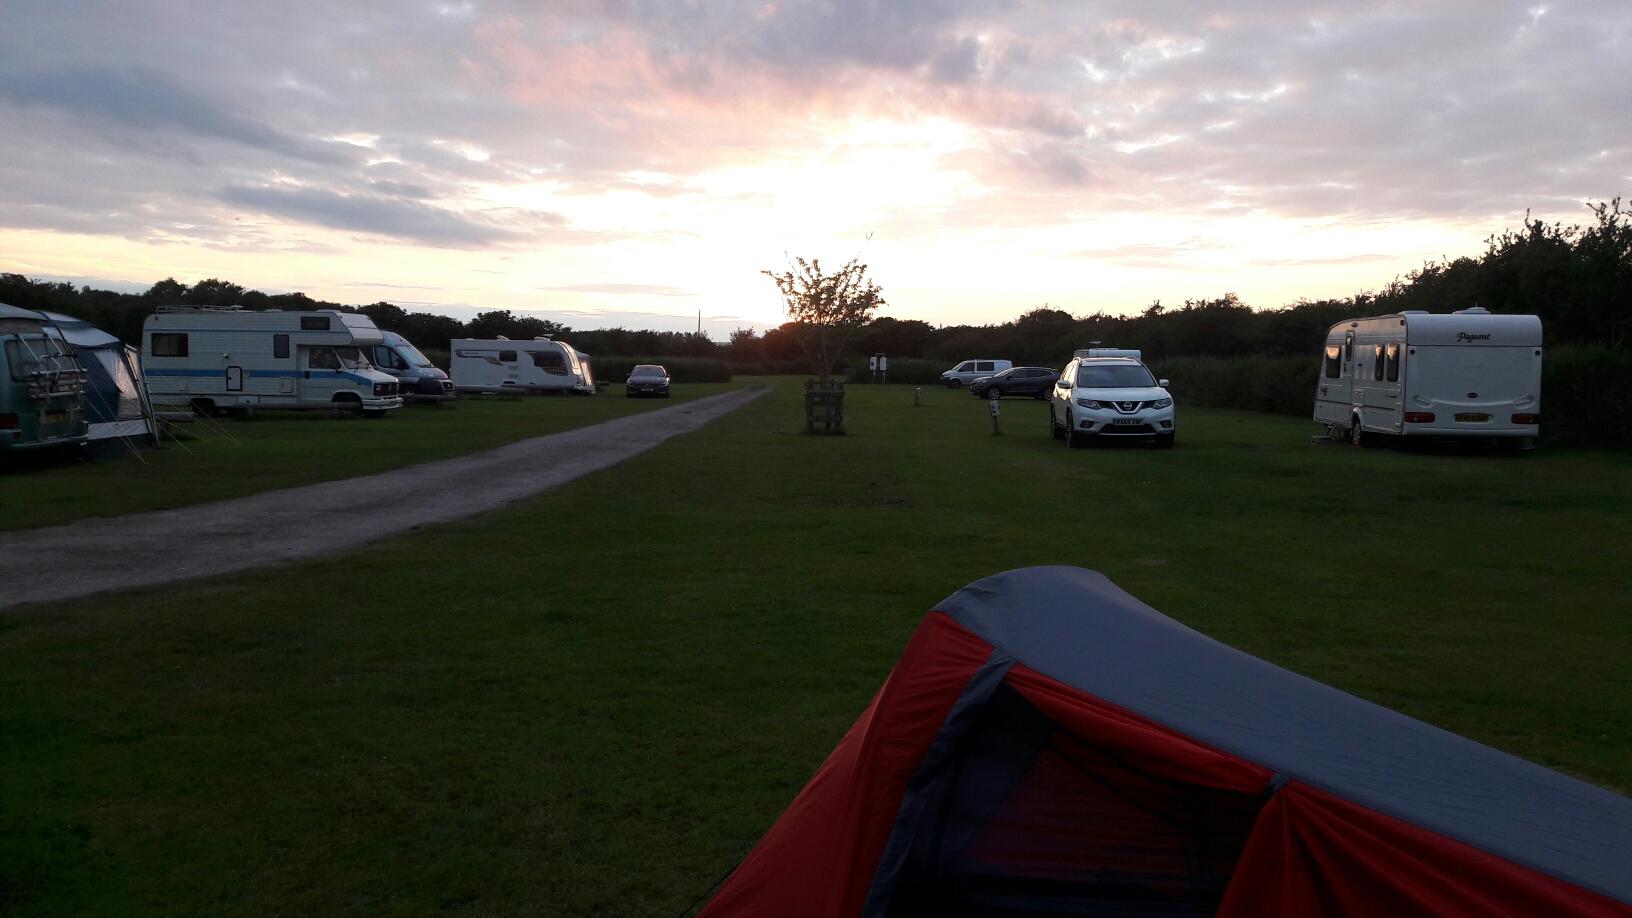 Sonnenuntergang auf dem Zeltplatz vonLittlehampton